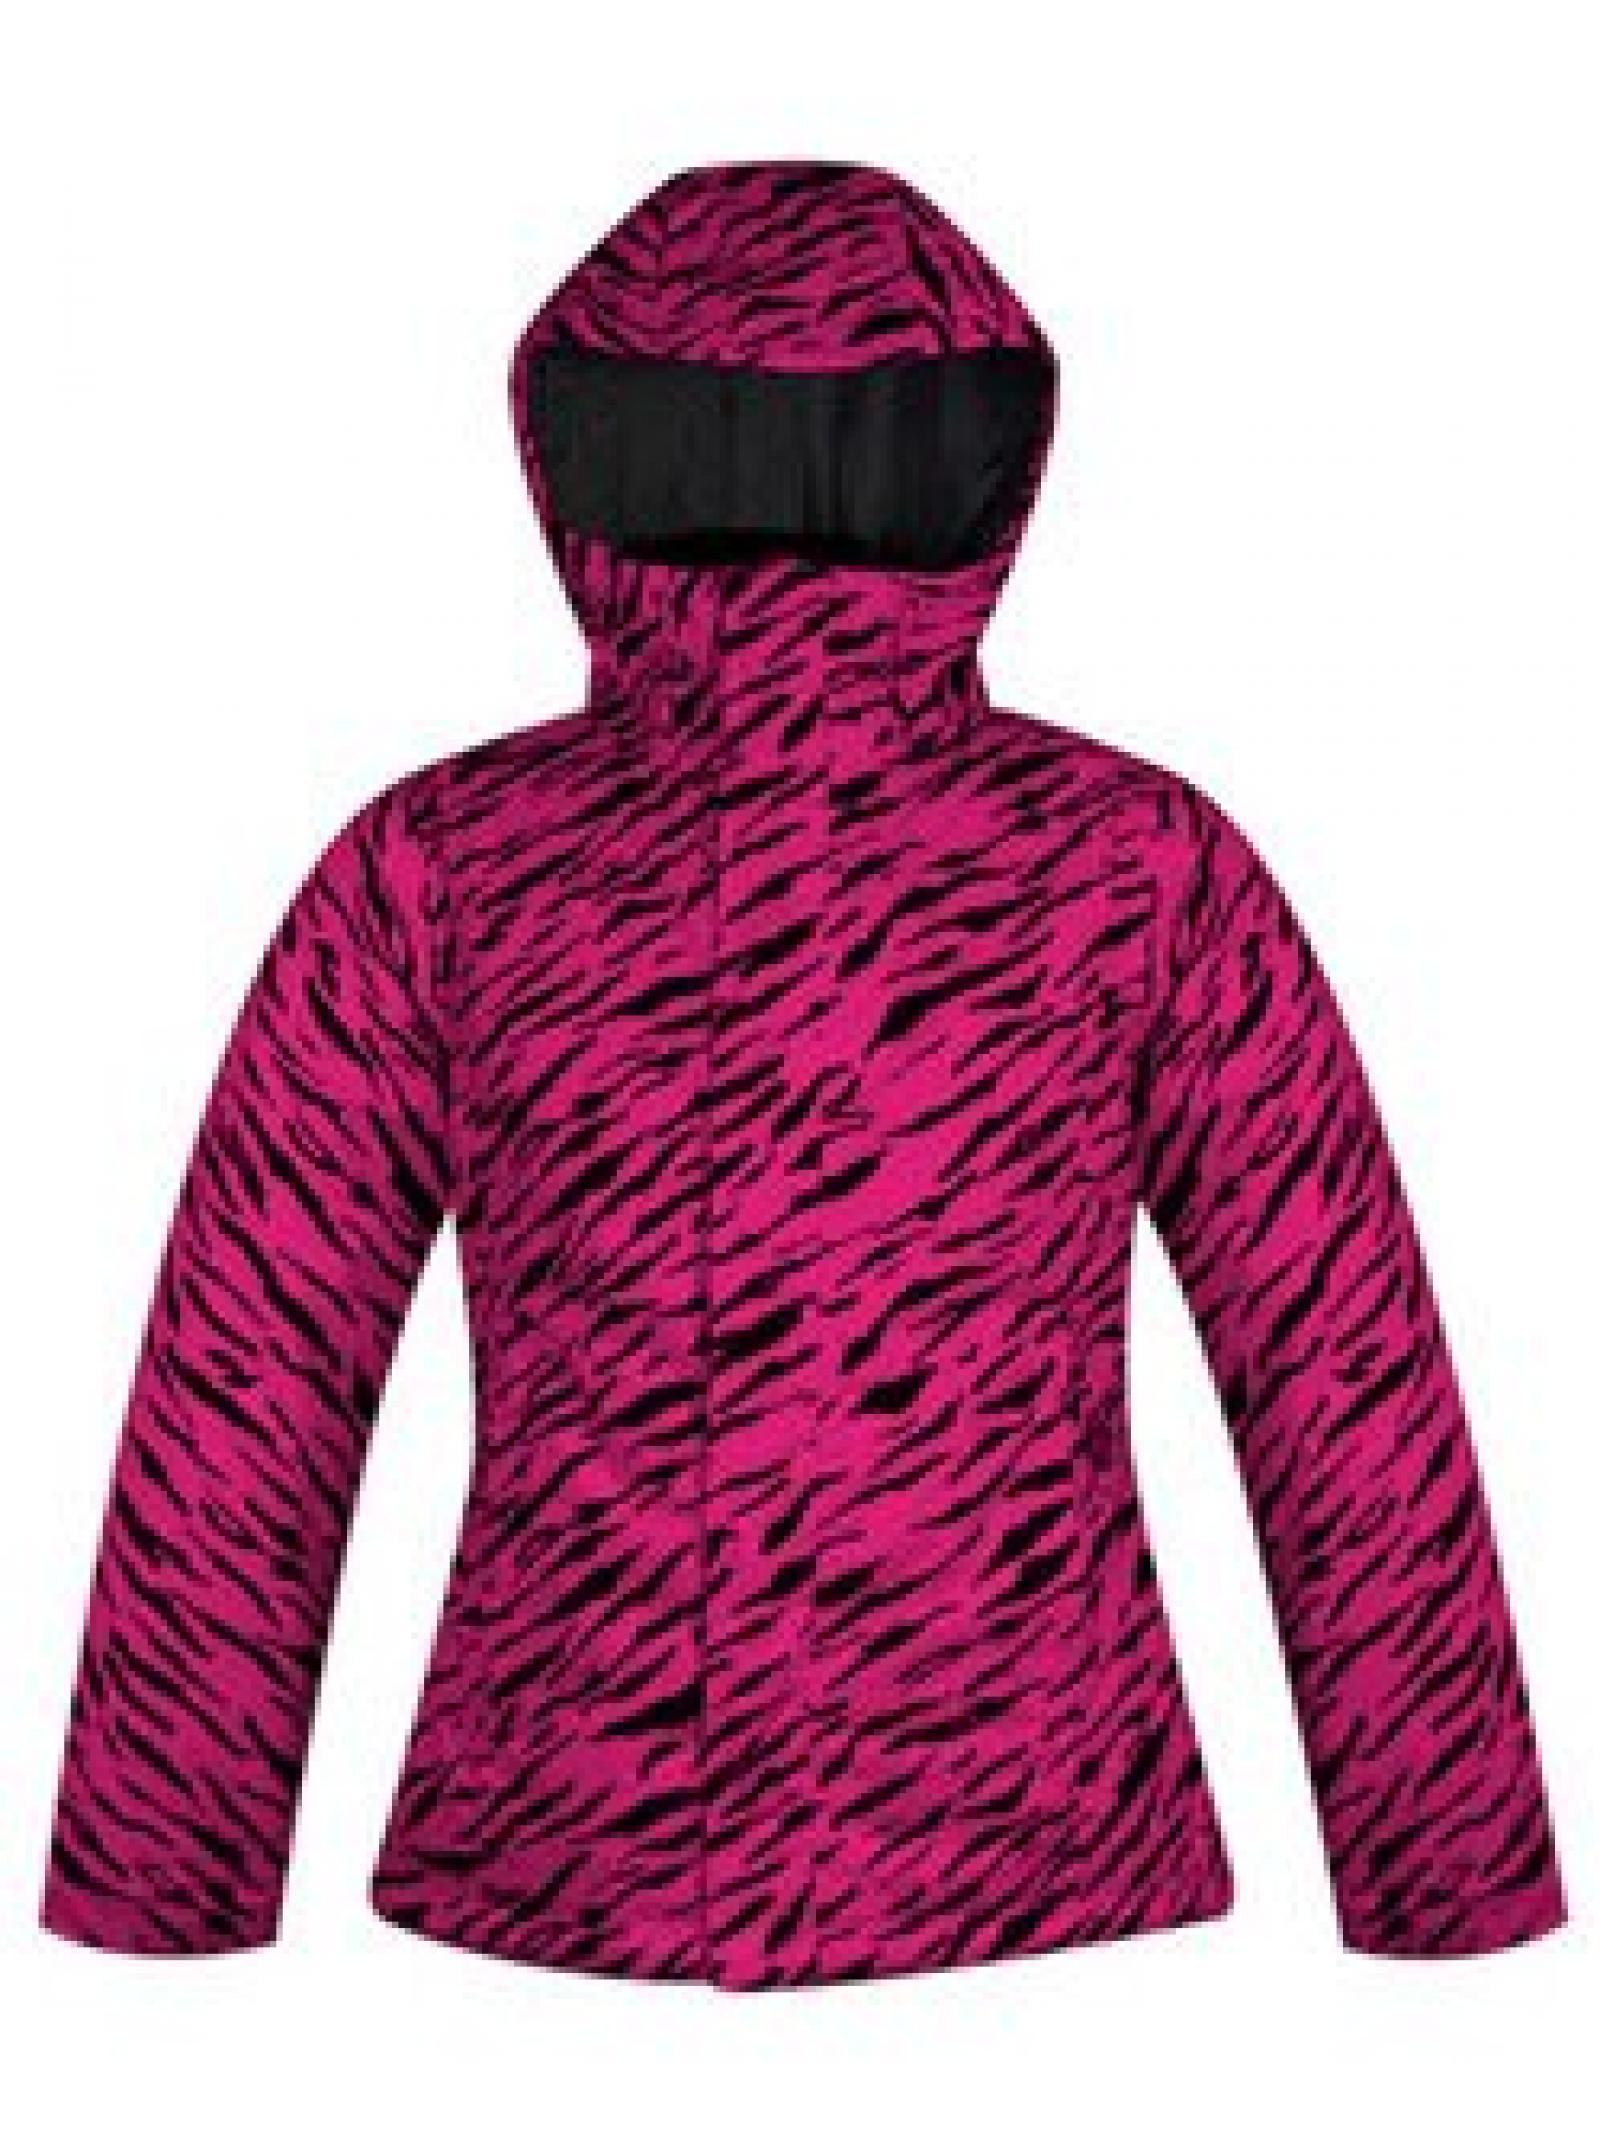 Betty Rides Damenwinterjacke DDN Nicole Parka Print (pink tigress)